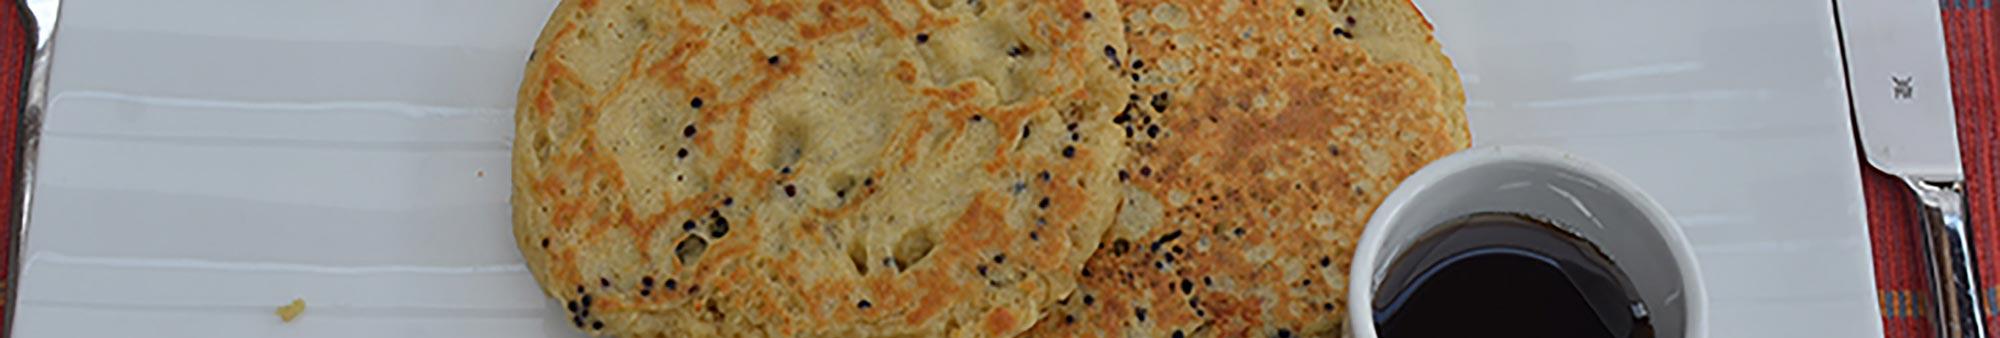 peruvian food blog featured image